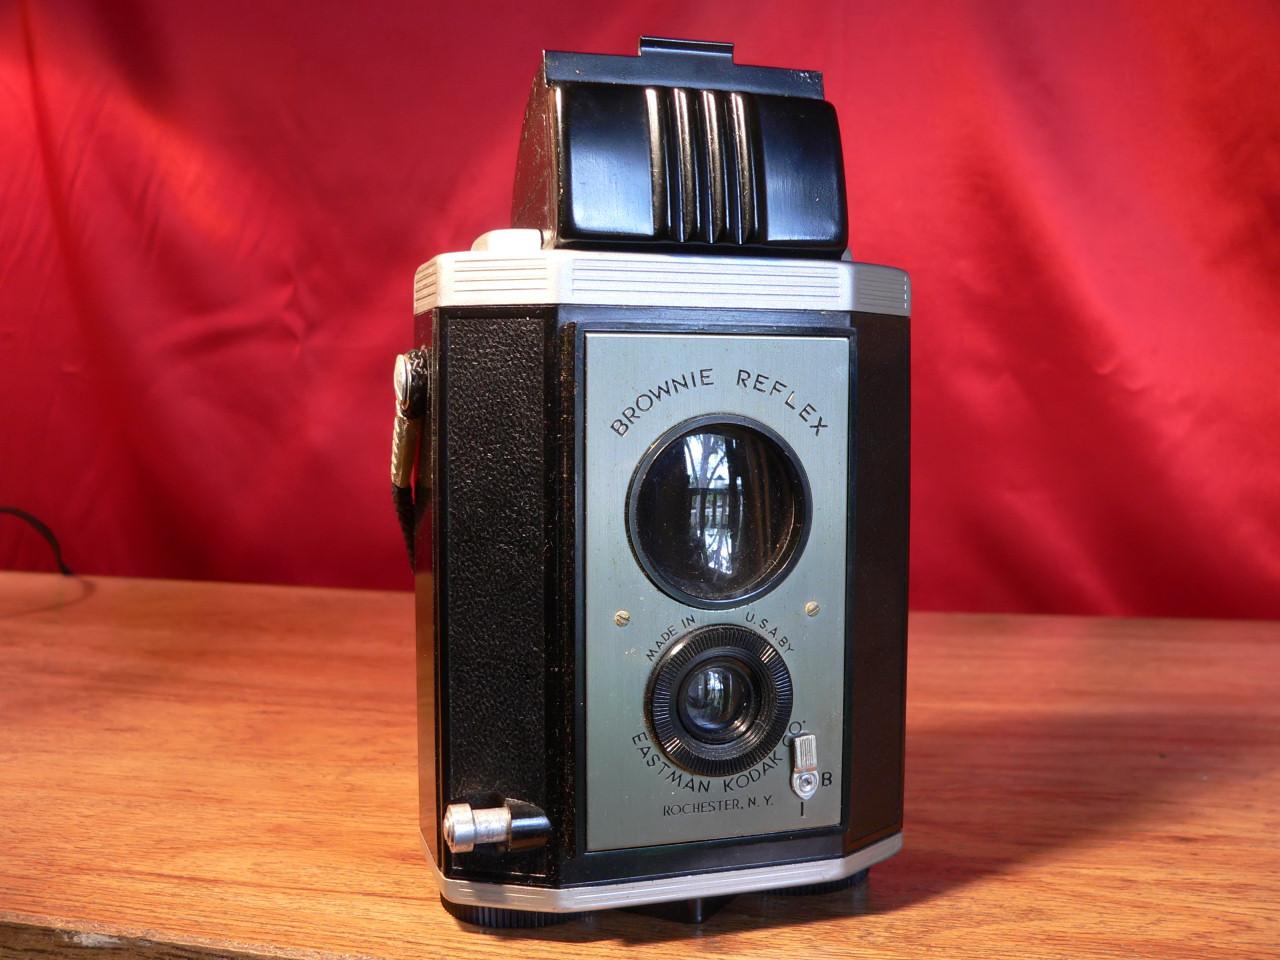 Eastman Kodak Brownie Reflex (1940-1941)